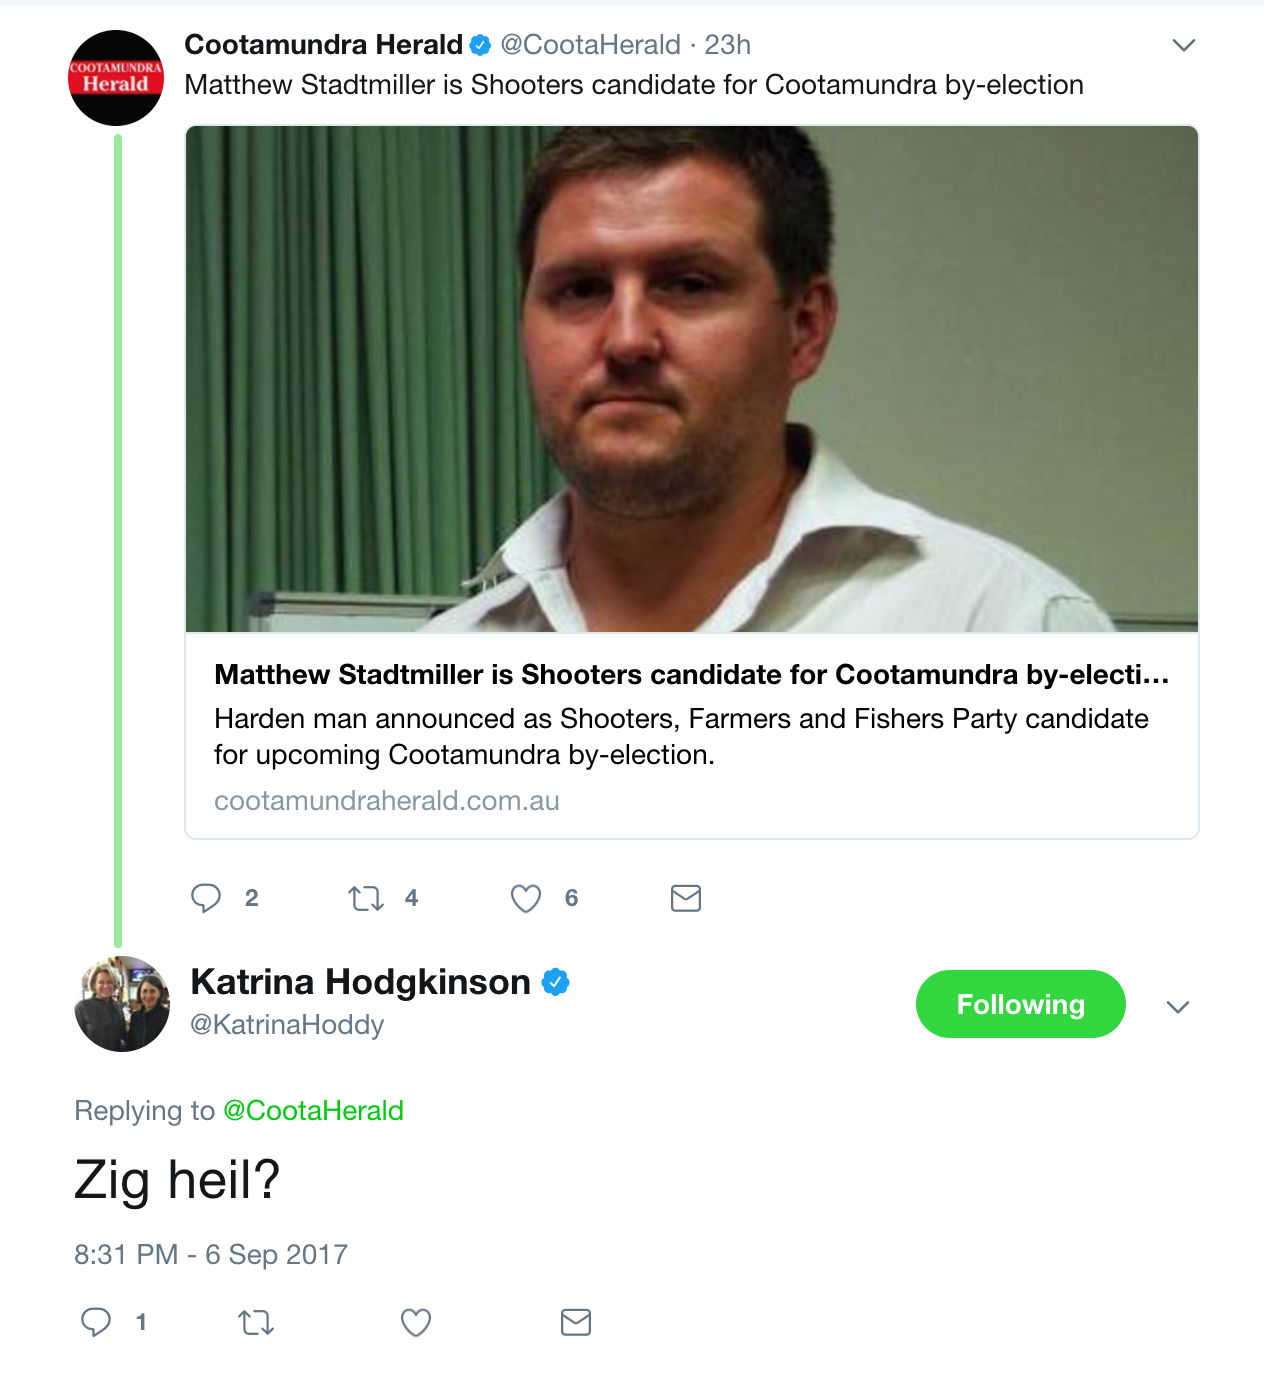 Katrina Hodgkinson's Nazi Slur